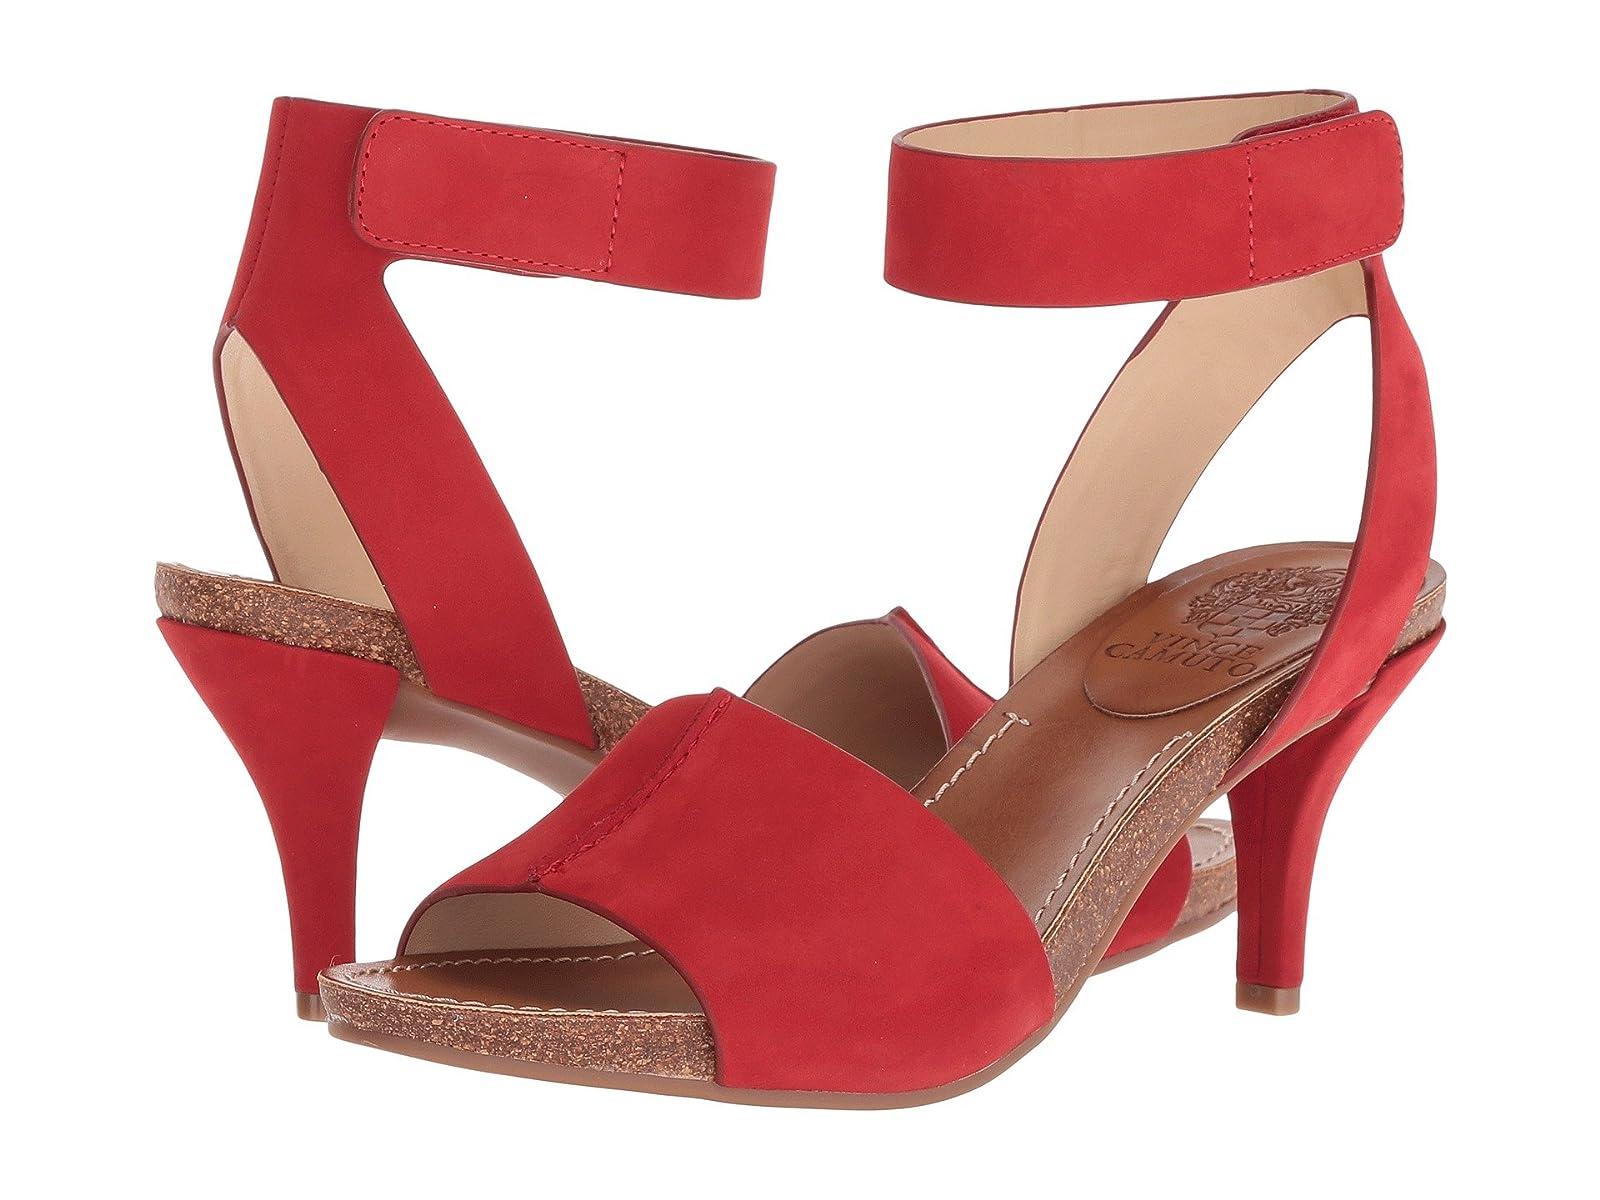 Vince Camuto OdelaAtmospheric grades have affordable shoes